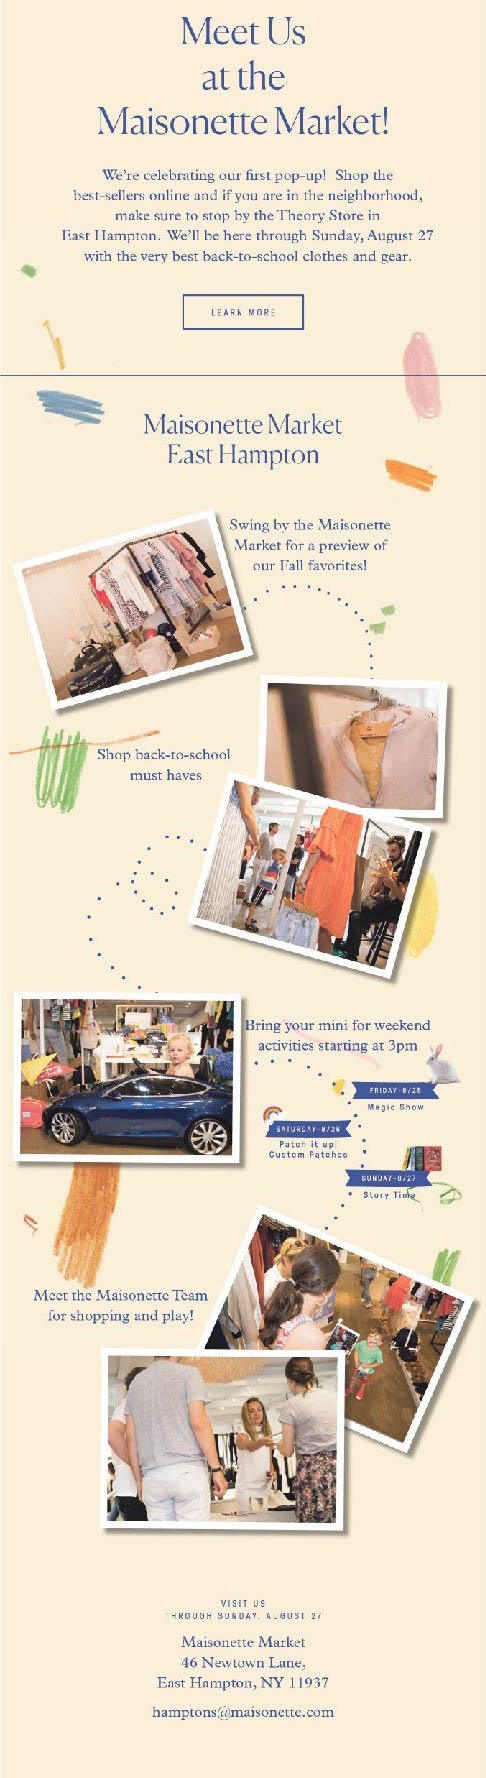 There's Still Time - Meet Us at the Maisonette Market!.jpg